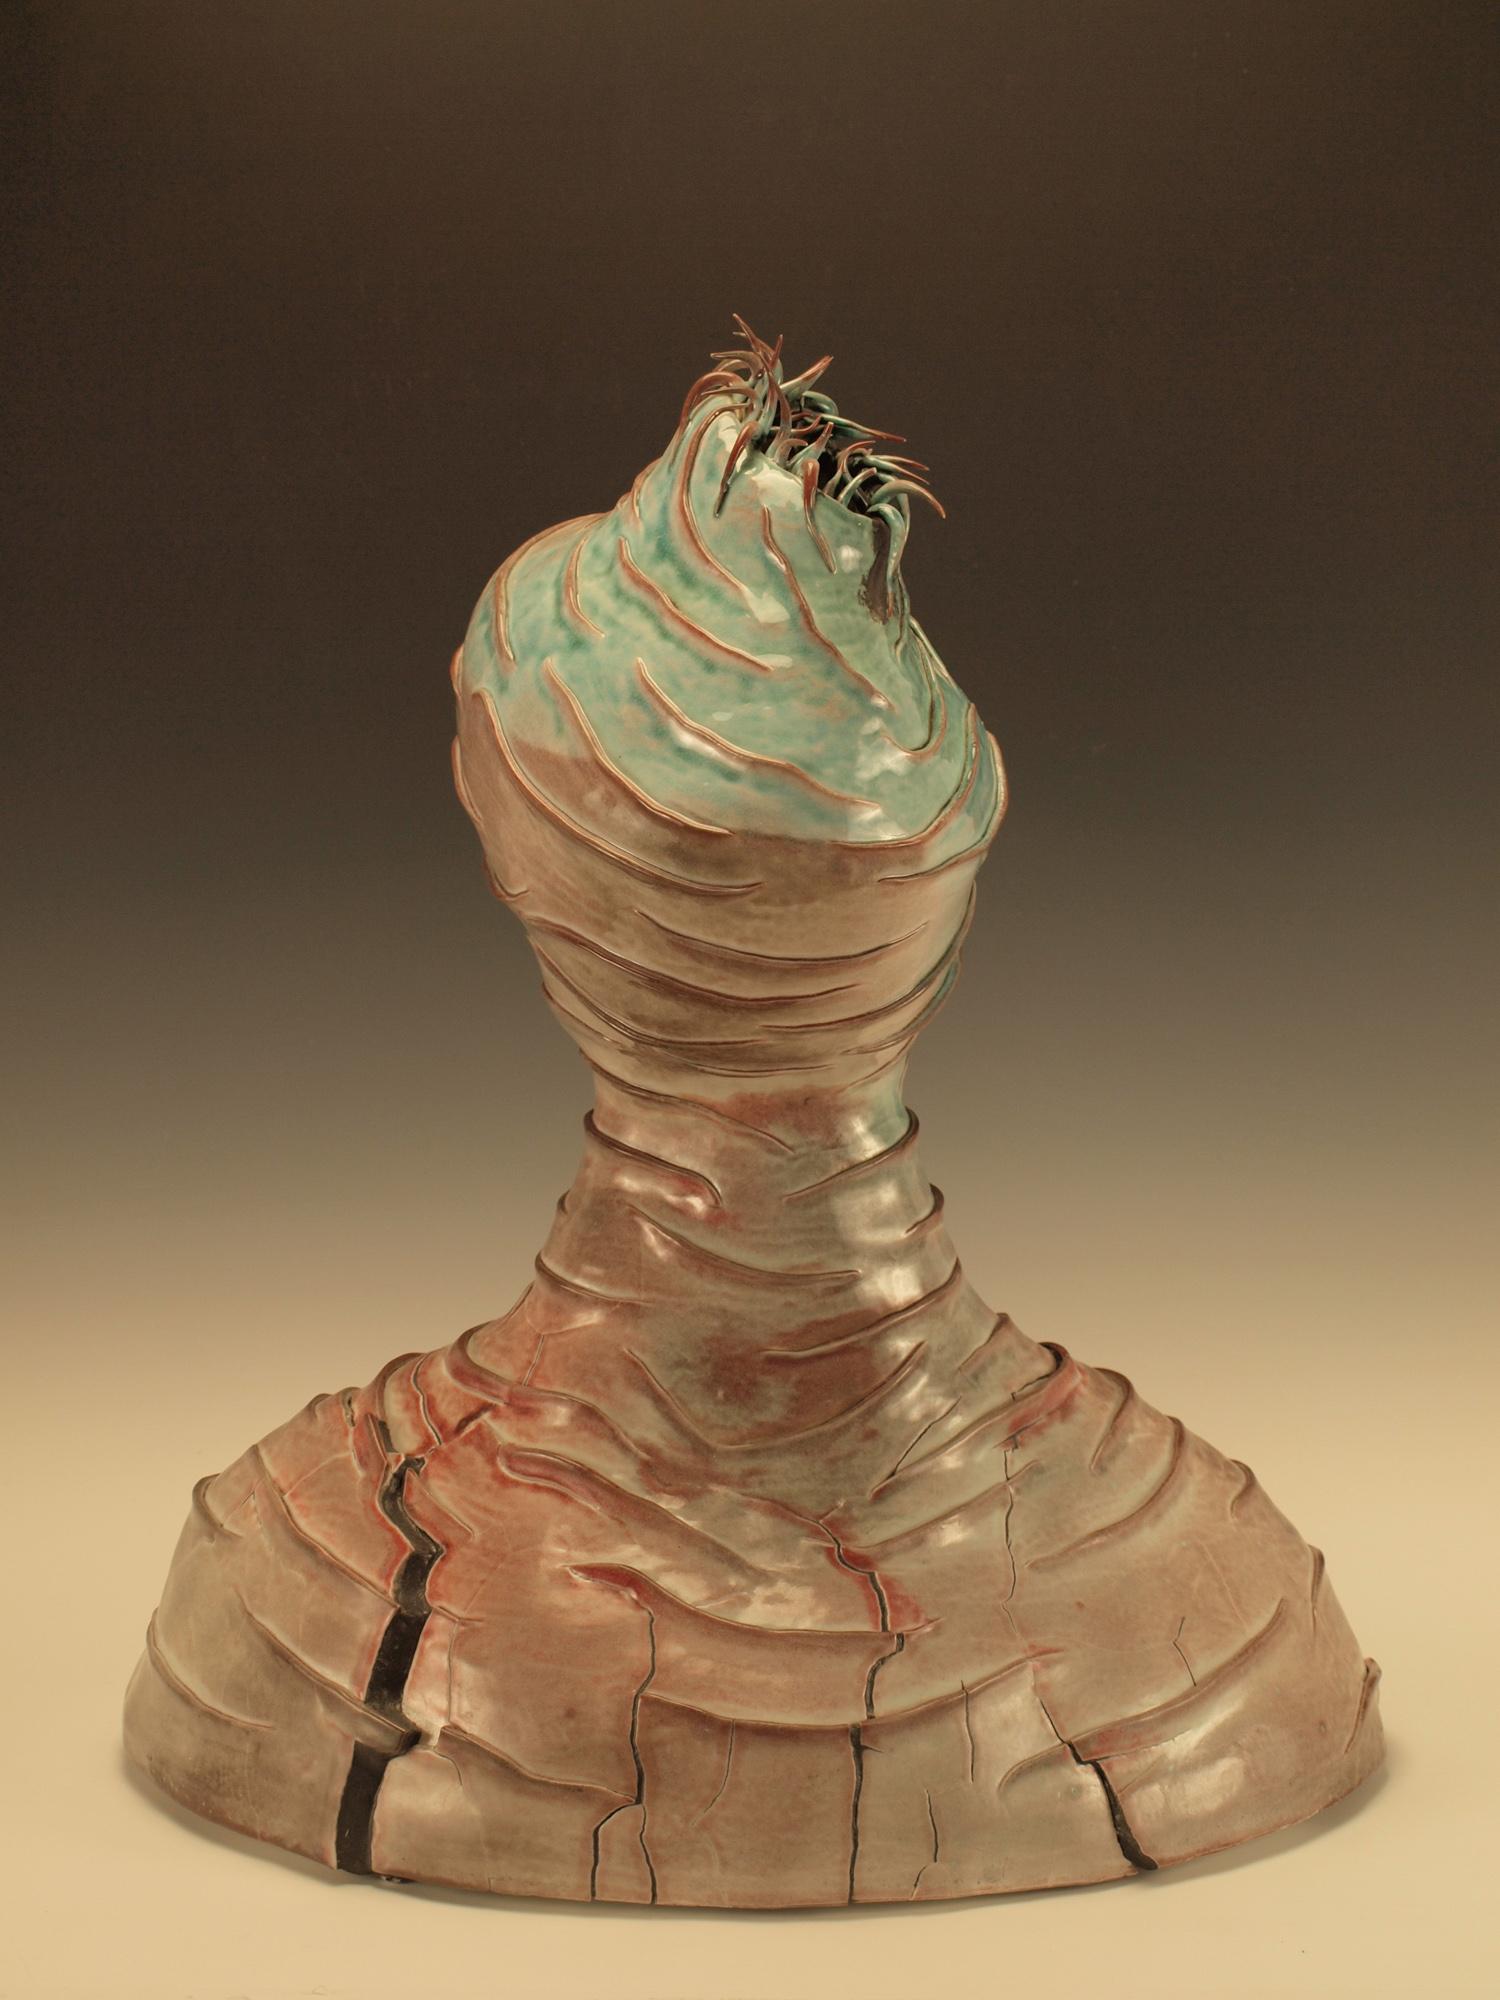 Bust of a Woman    Porcelain  2016